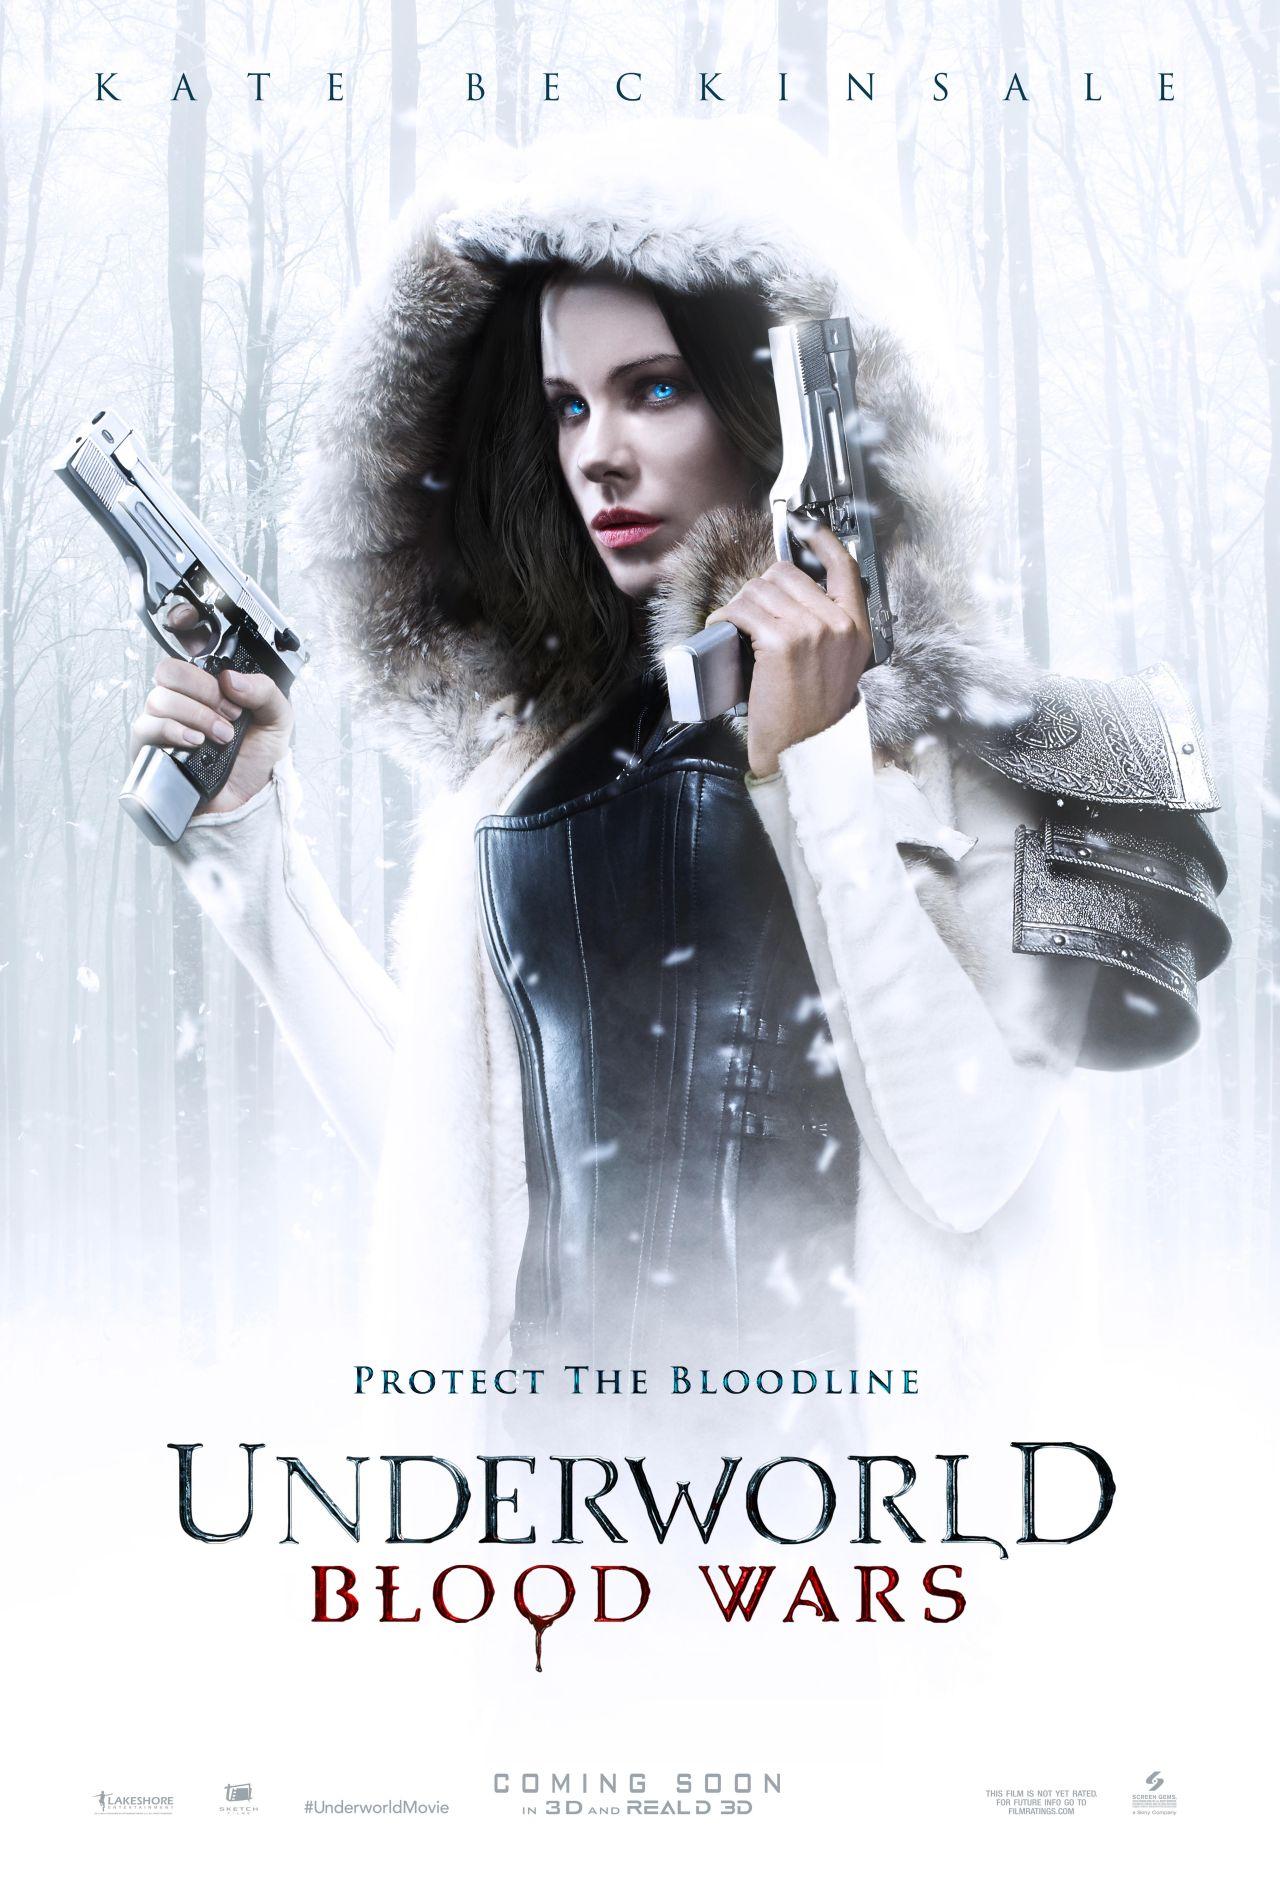 underworld-blood-wars-dom-uw5_dom_fnl_1sht_lk125_072_rgb